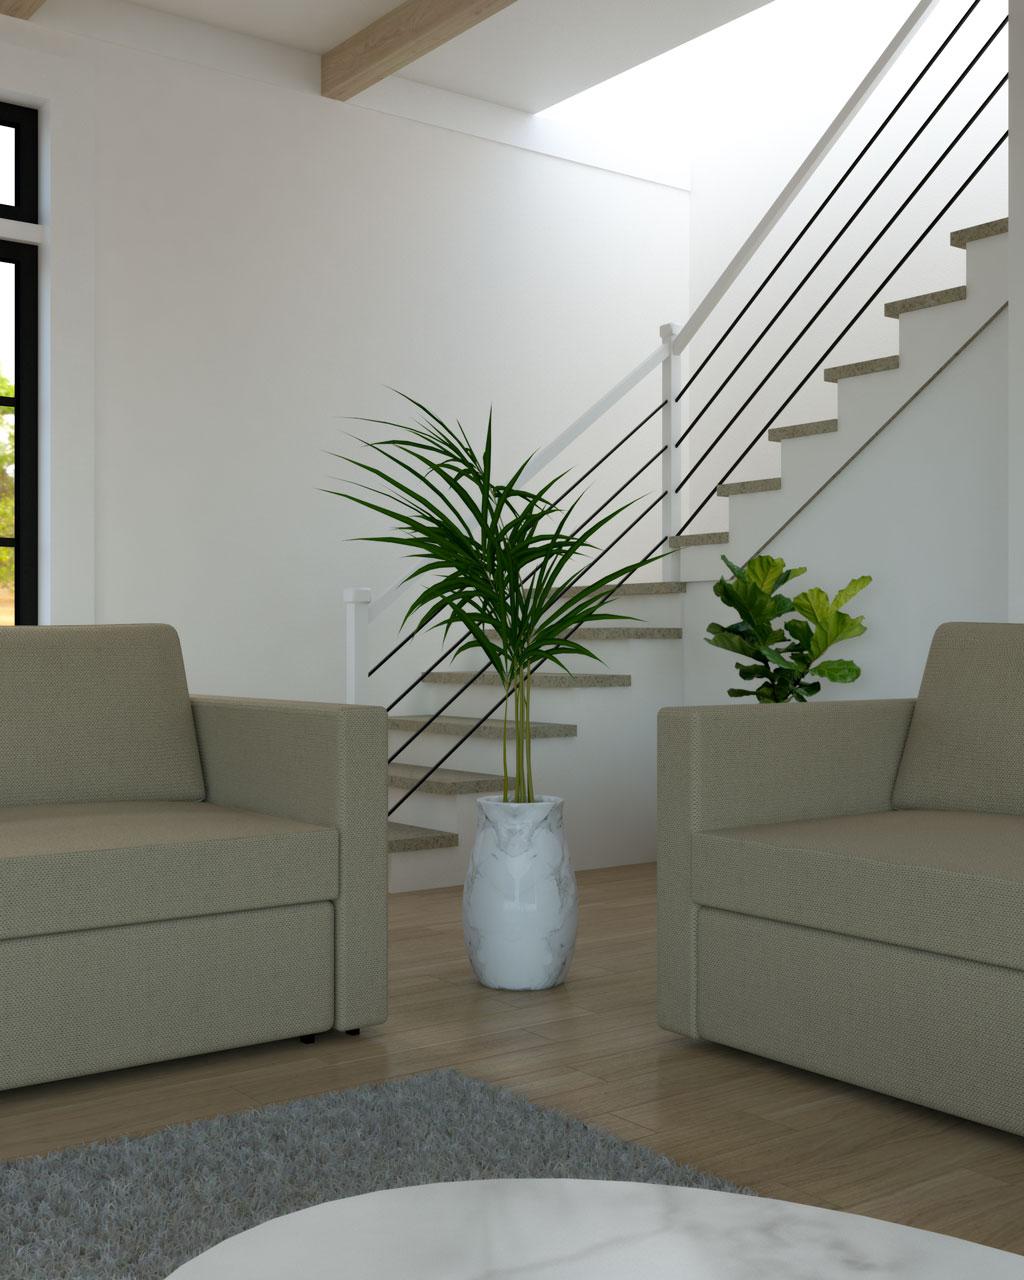 Plant in corner between sofa and loveseat